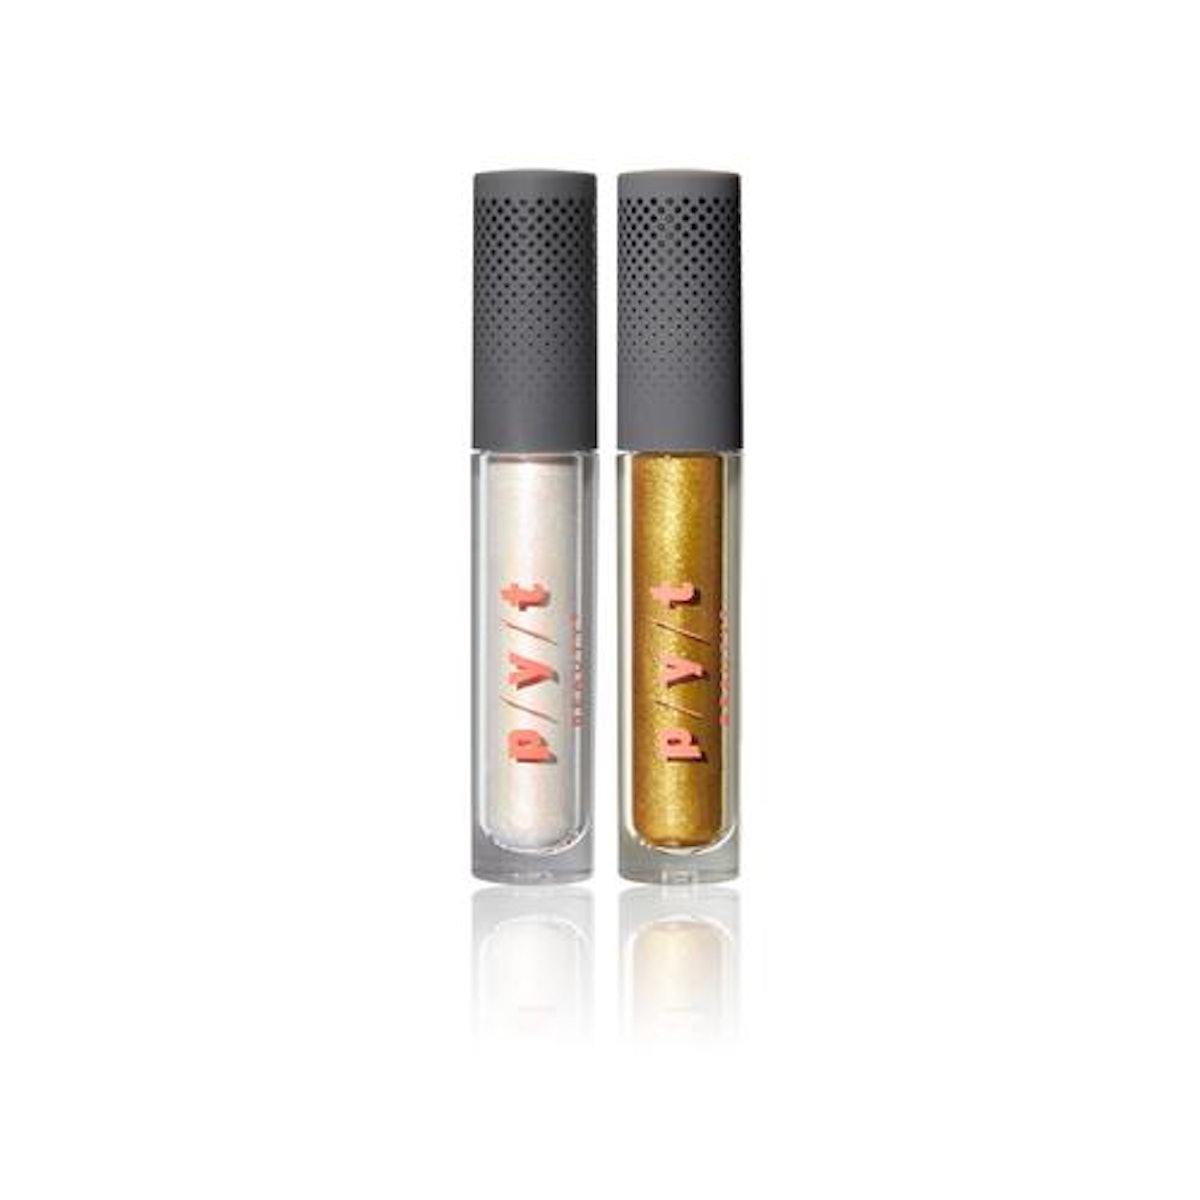 Glam Glitter Gel Set of 2 - Gold & Iridescent